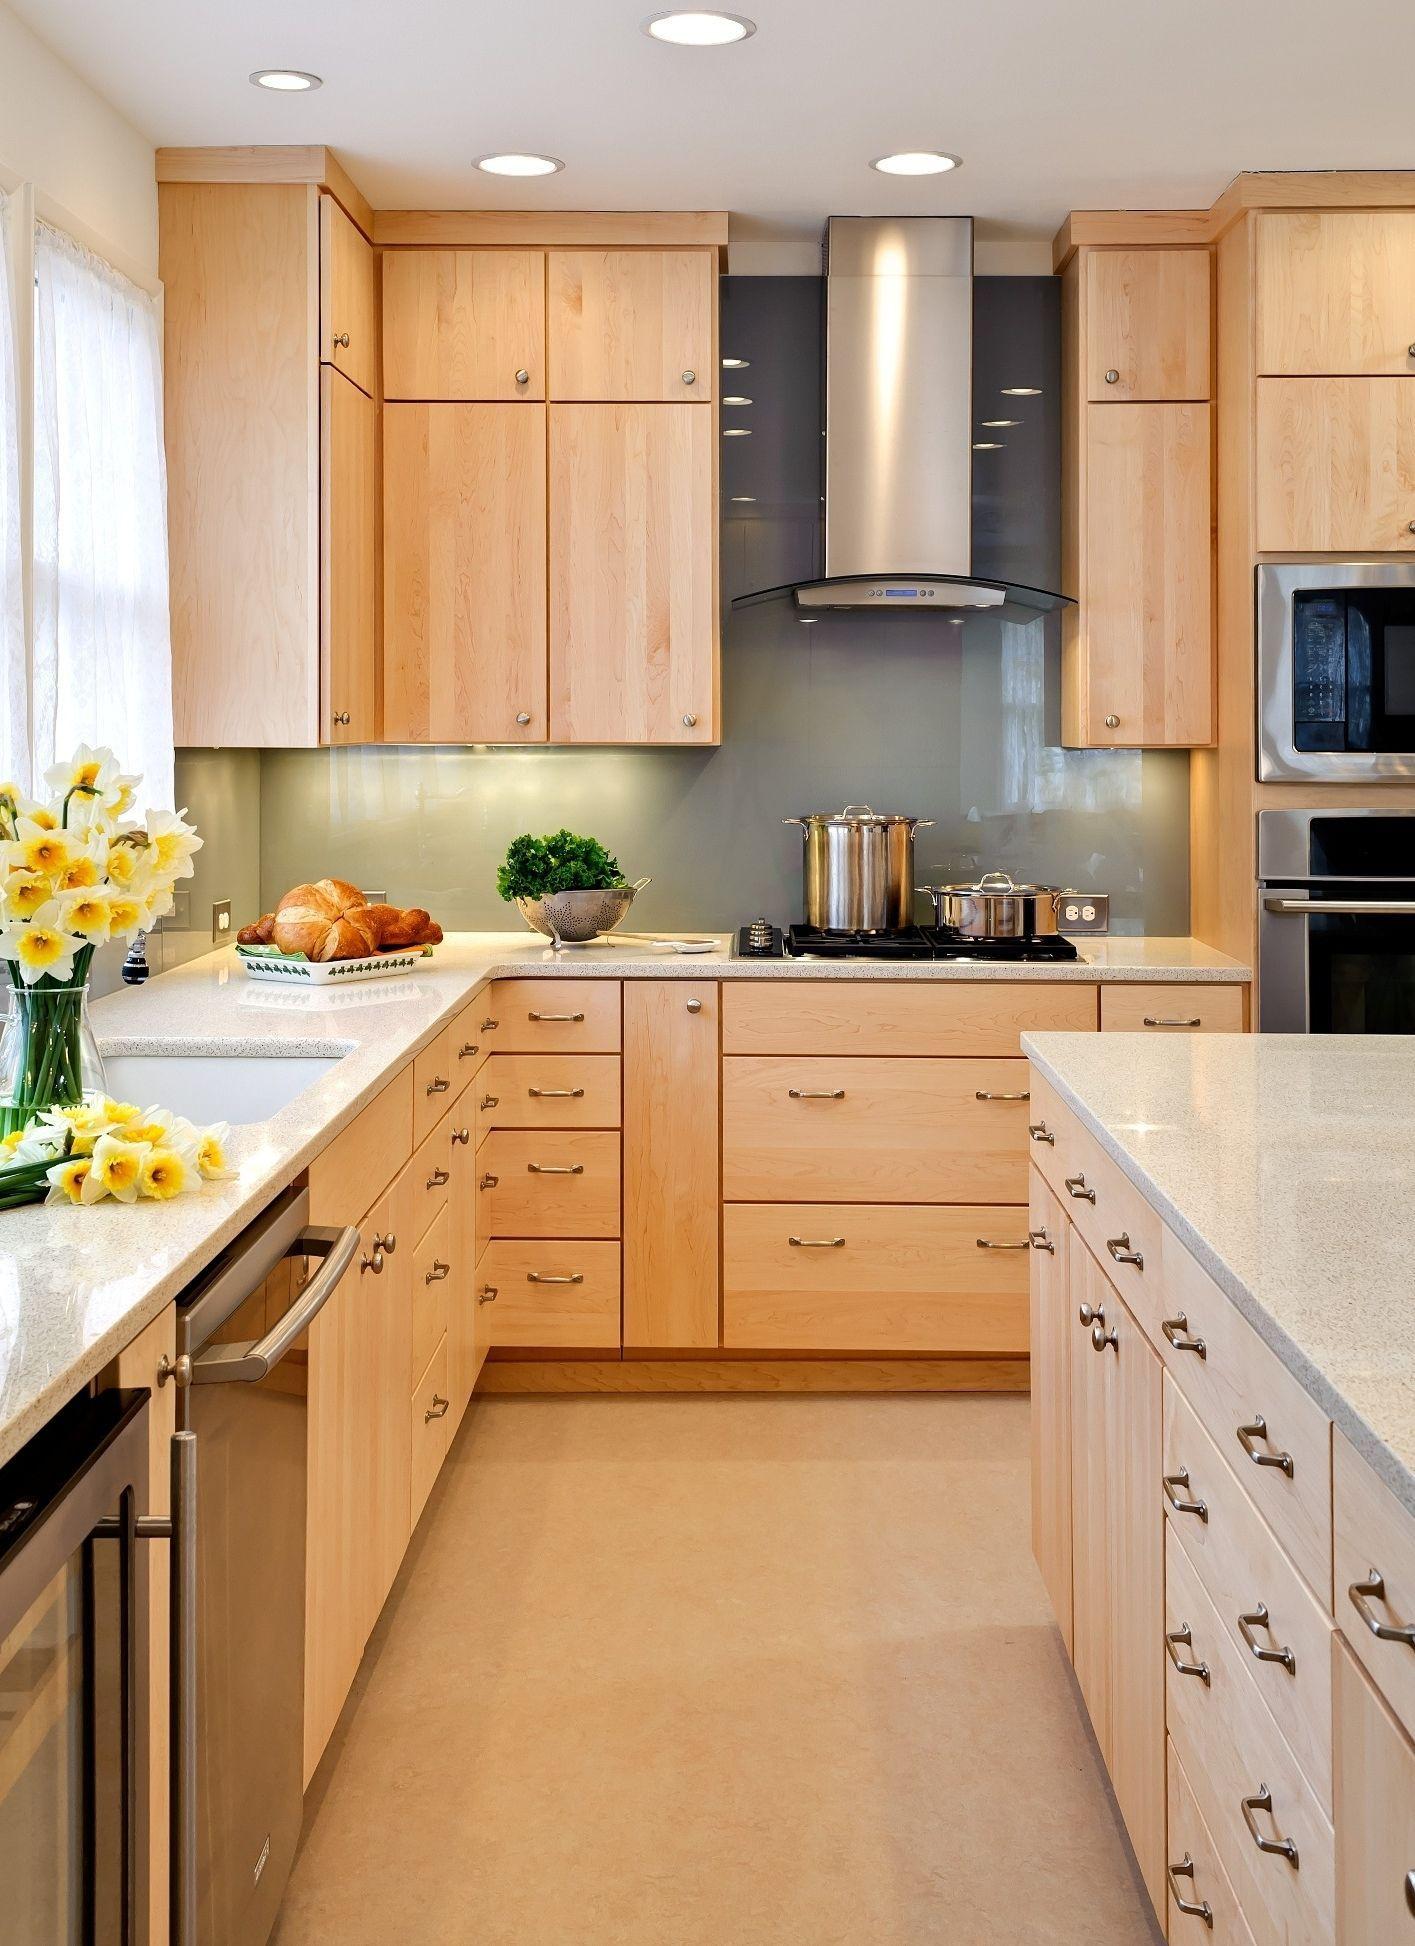 Light Birch Kitchen Cabinets 2021 in 2020 | Contemporary ...